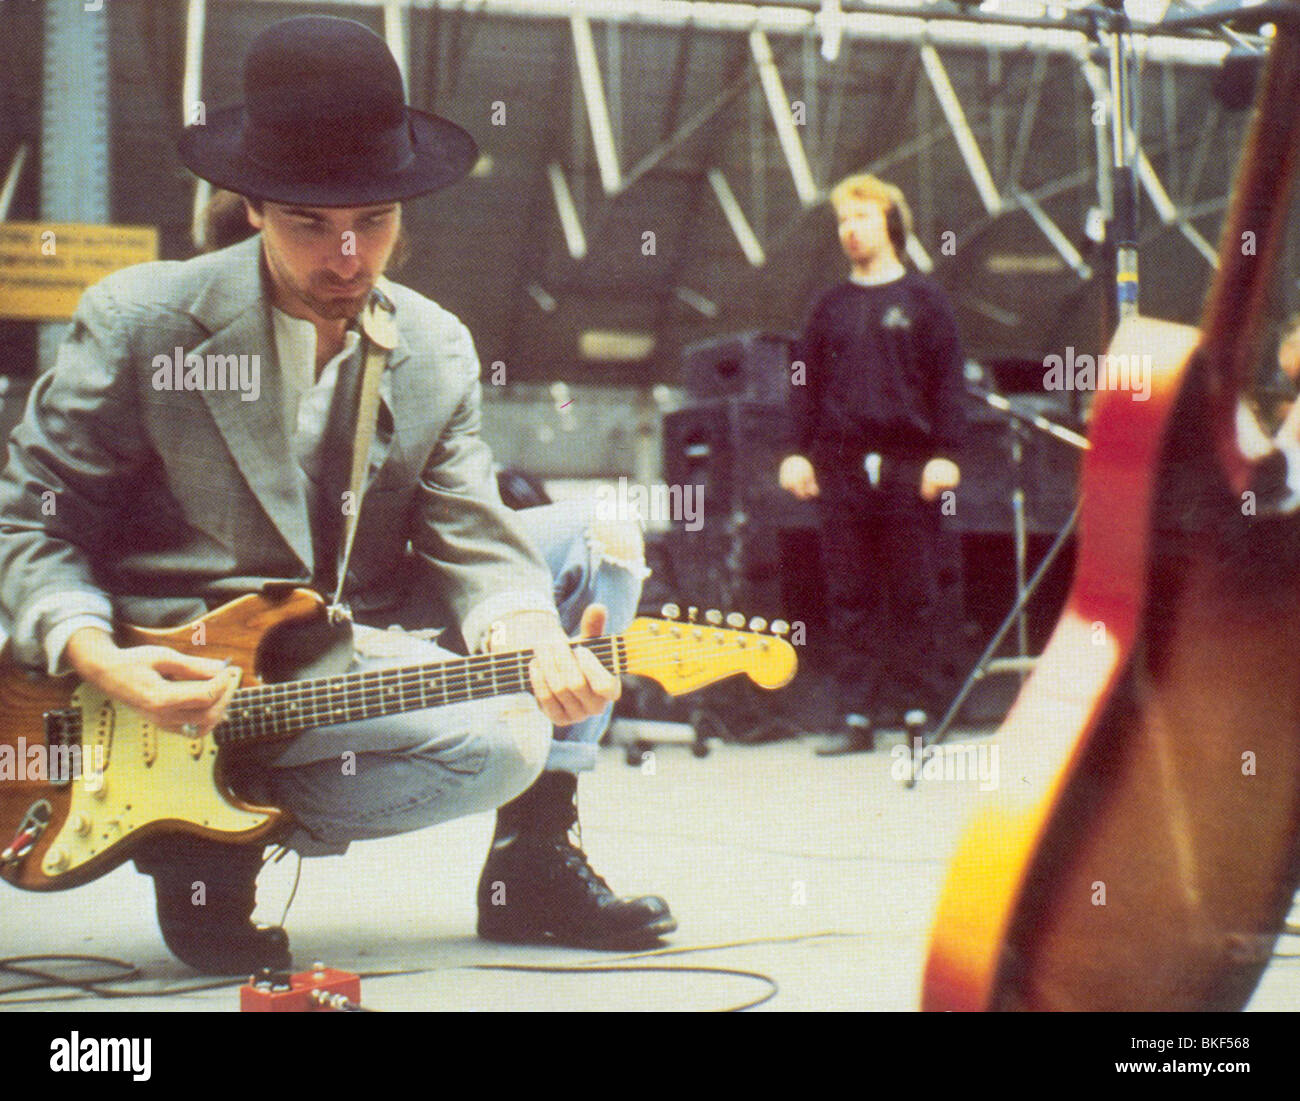 U2 : RATTLE AND HUM (1988) THE EDGE U2R 005FOH - Stock Image